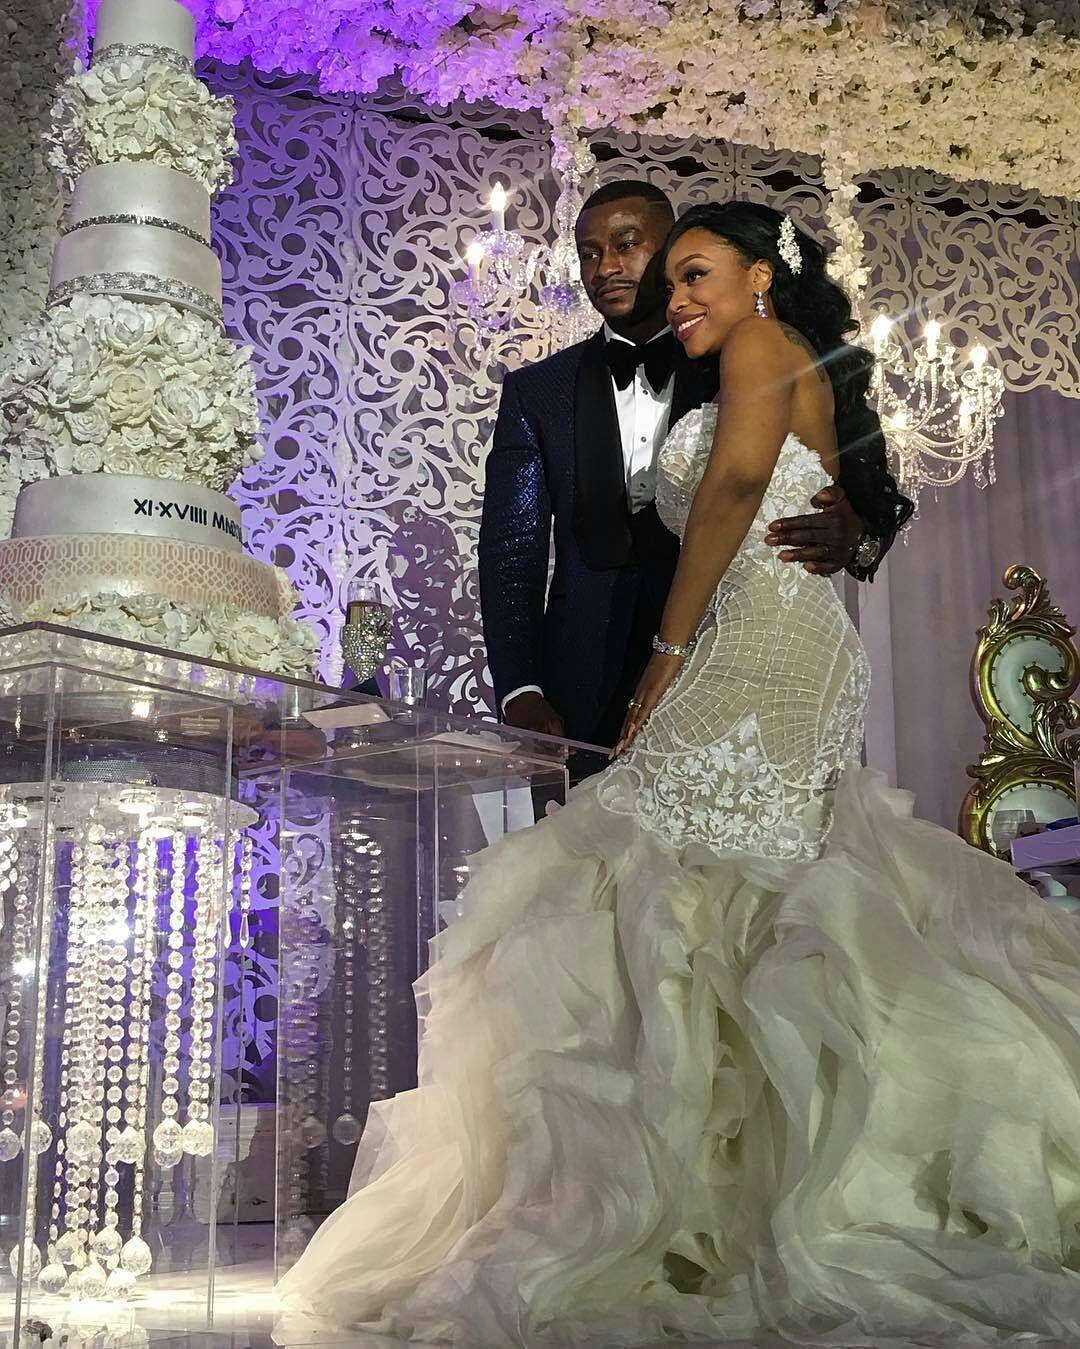 Kandi burruss wedding dress  So beautiful Via urbanluxe  ucTwo are better than oneuif either